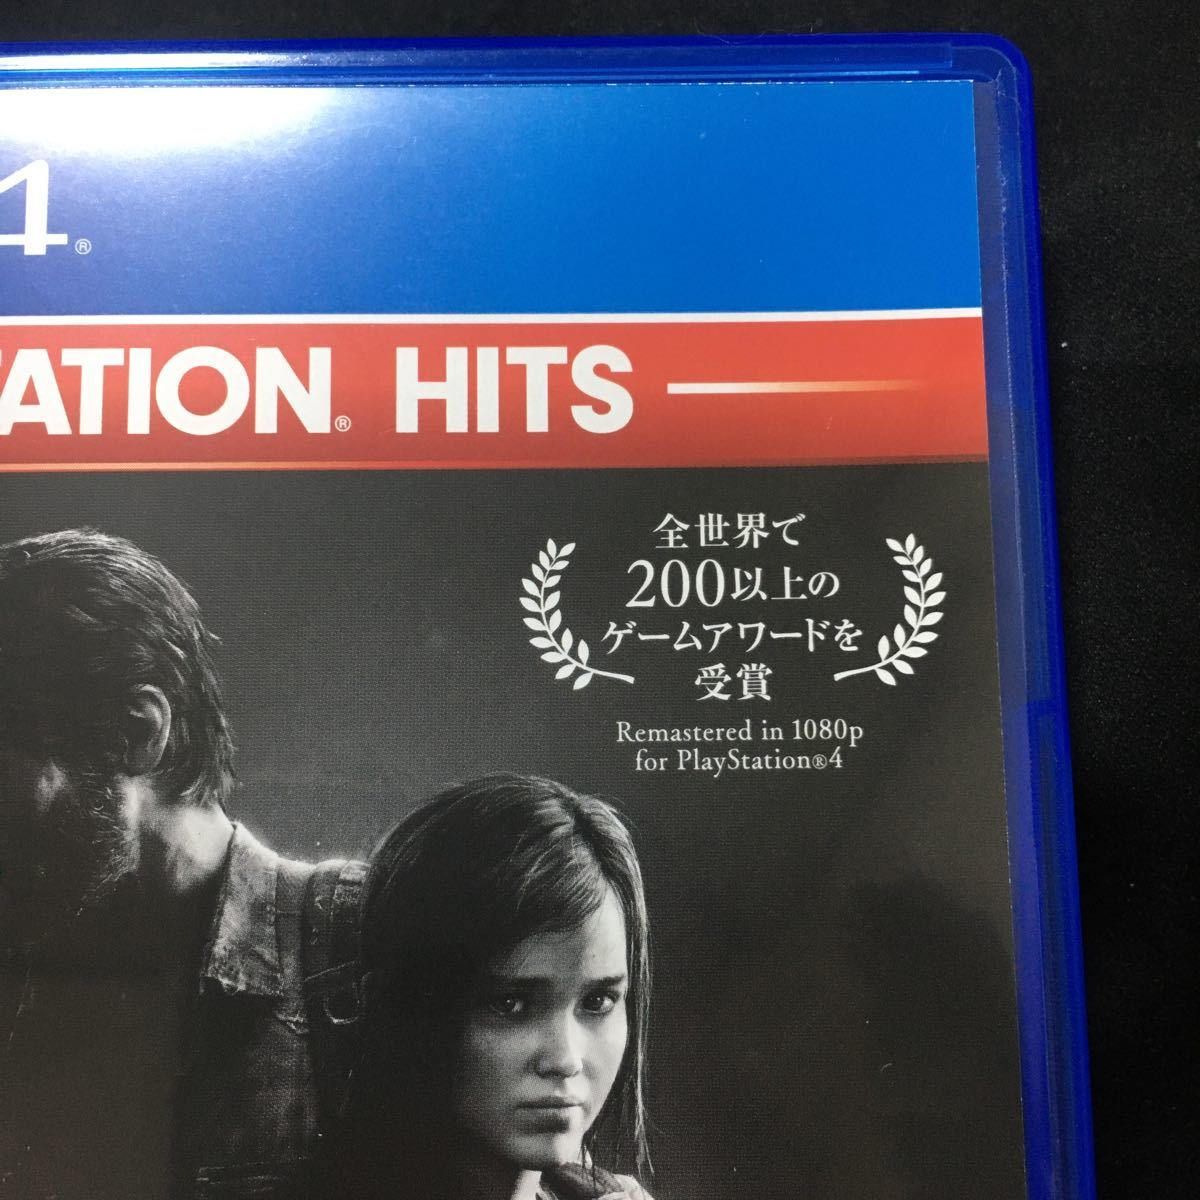 【PS4】 ラストオブアス ラスアス Remastered [PlayStation Hits]送料無料、匿名配送、当日発送可能♪